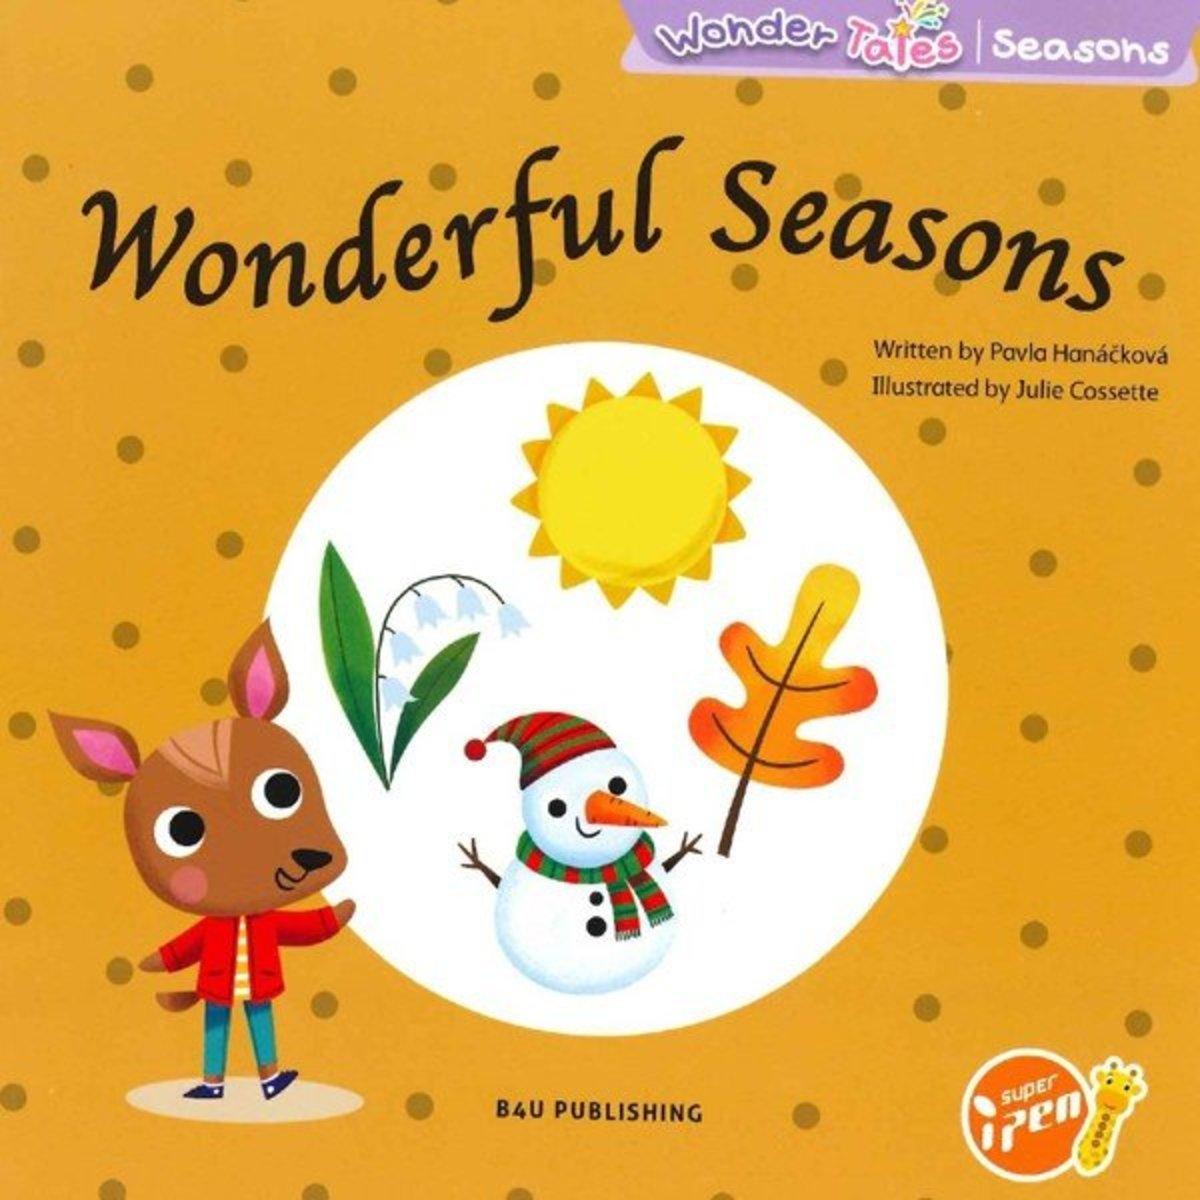 Wonder Tales 英文繪本 (K3)—Wonderful Seasons (Non-fiction)